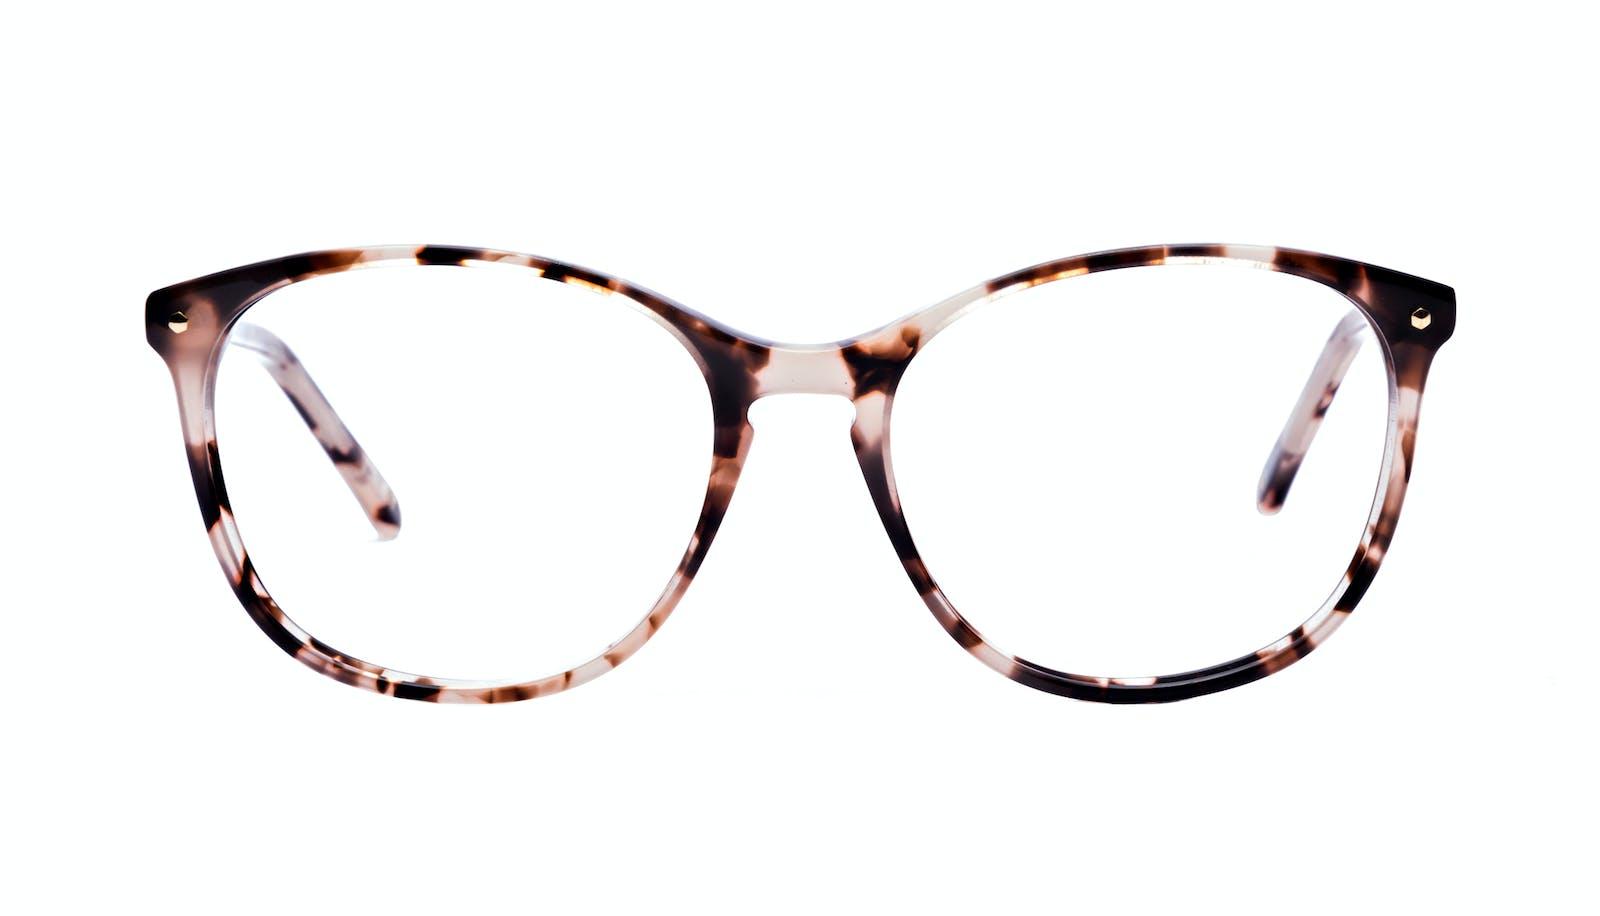 38788523d931cd Affordable Fashion Glasses Rectangle Square Round Eyeglasses Women Nadine  Pink Tortoise